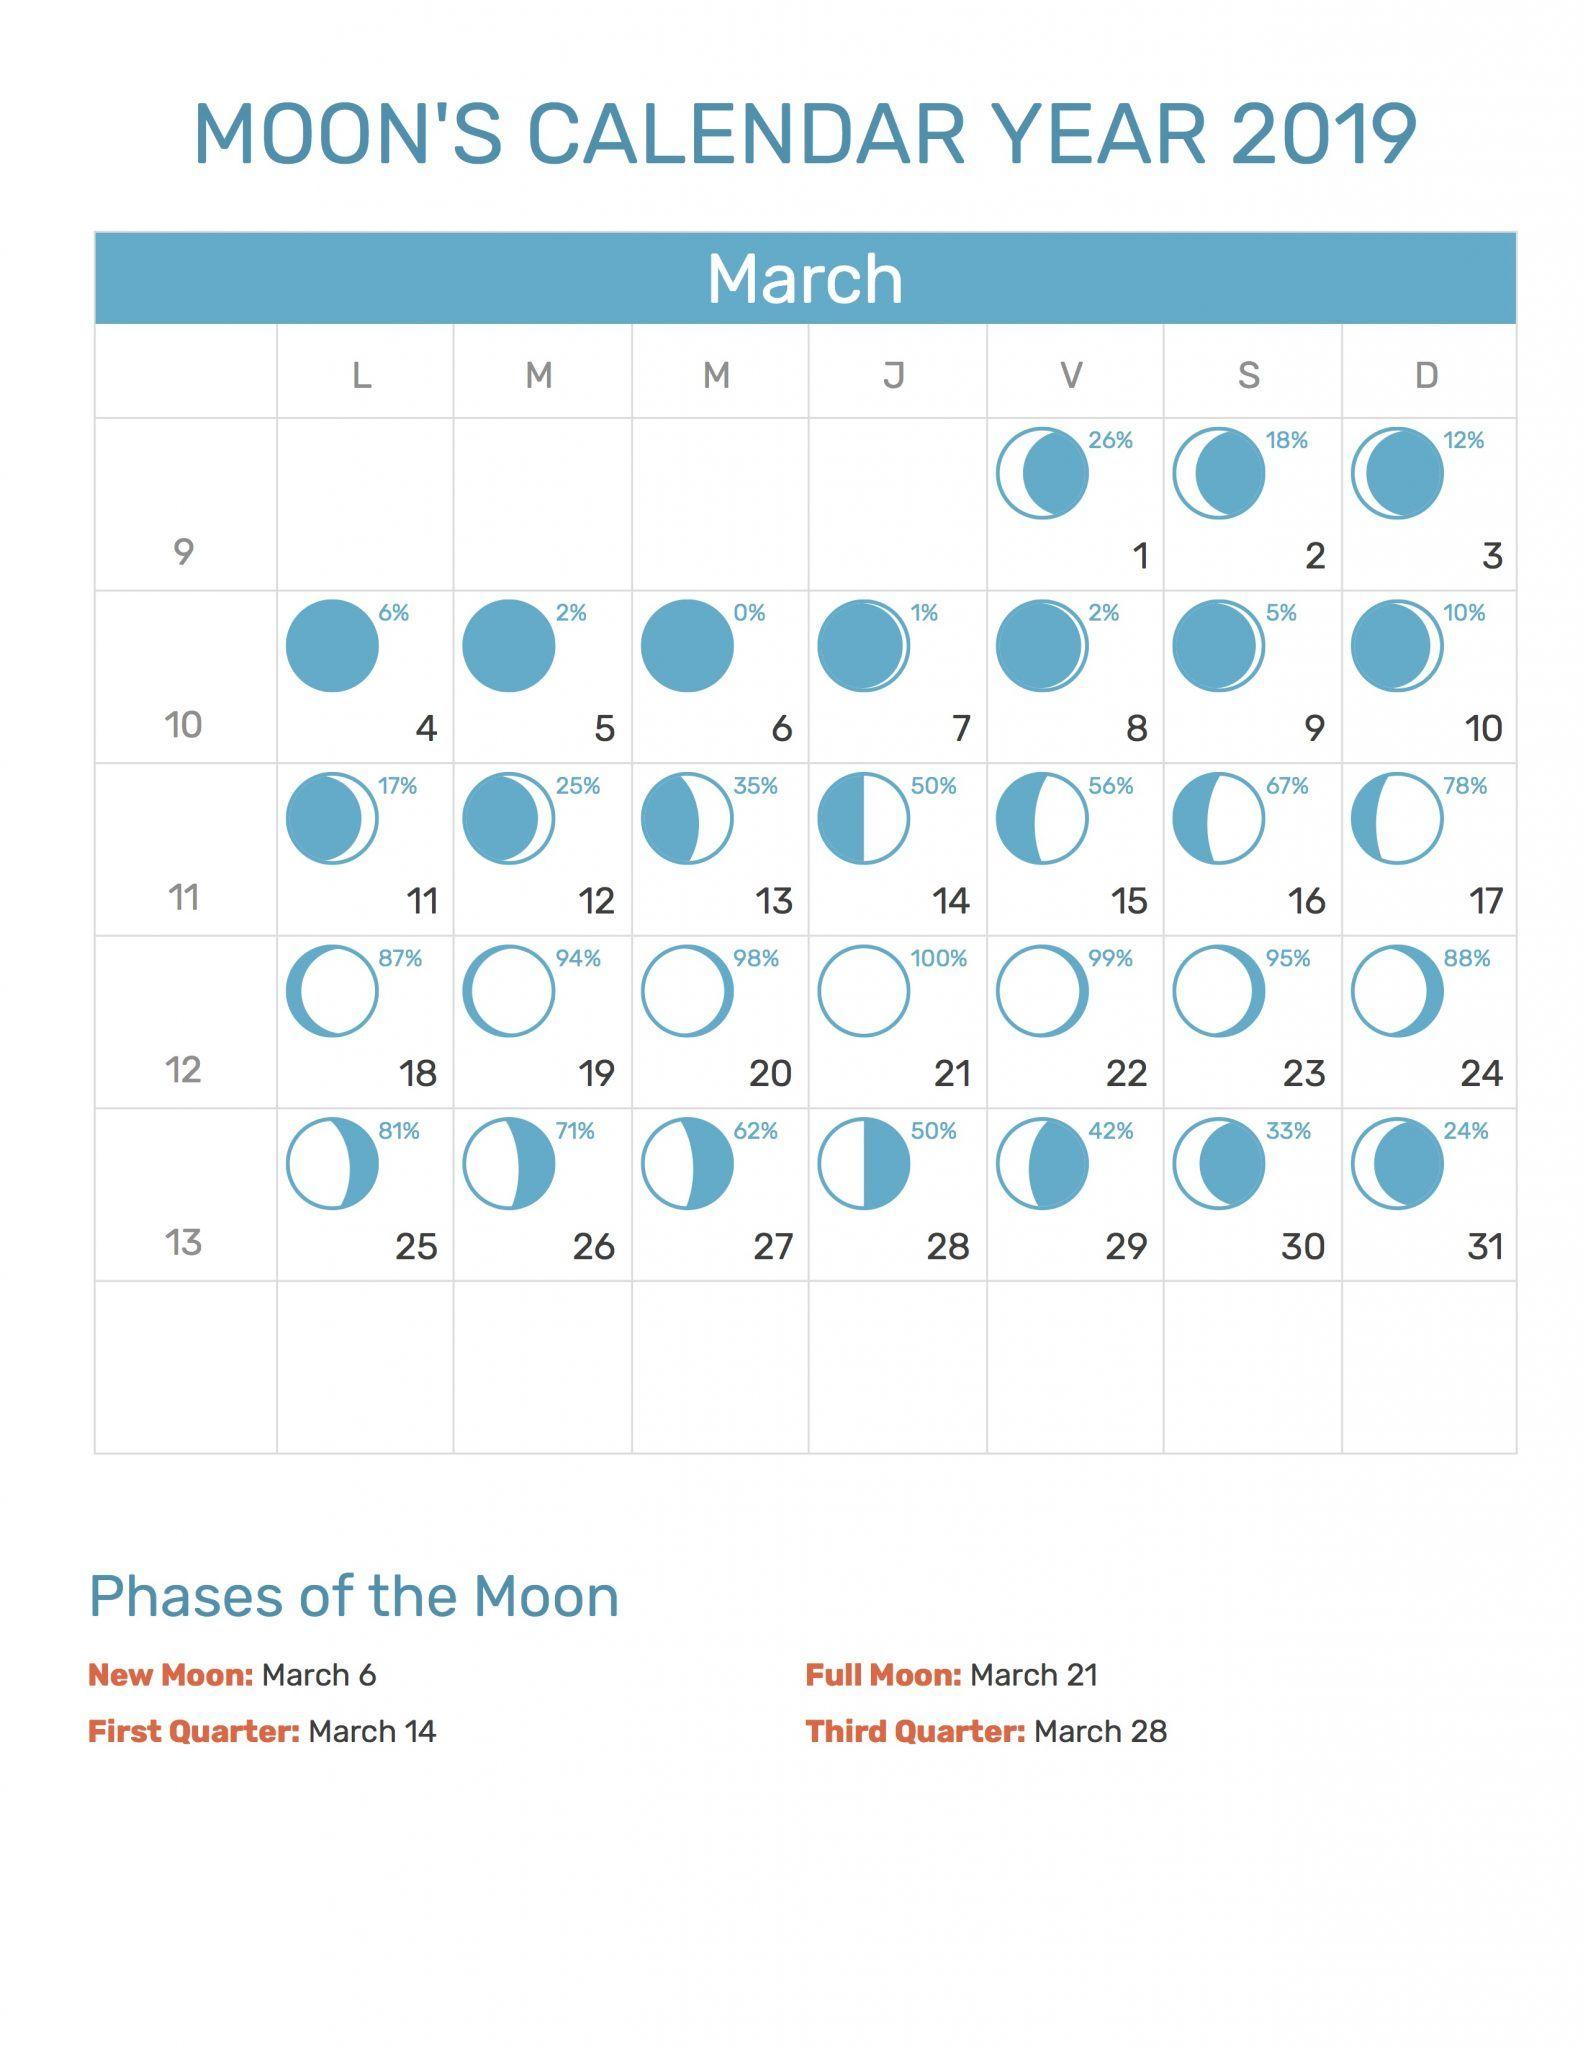 Full Moon Calendar March 2019 #march2019 #mooncalendar